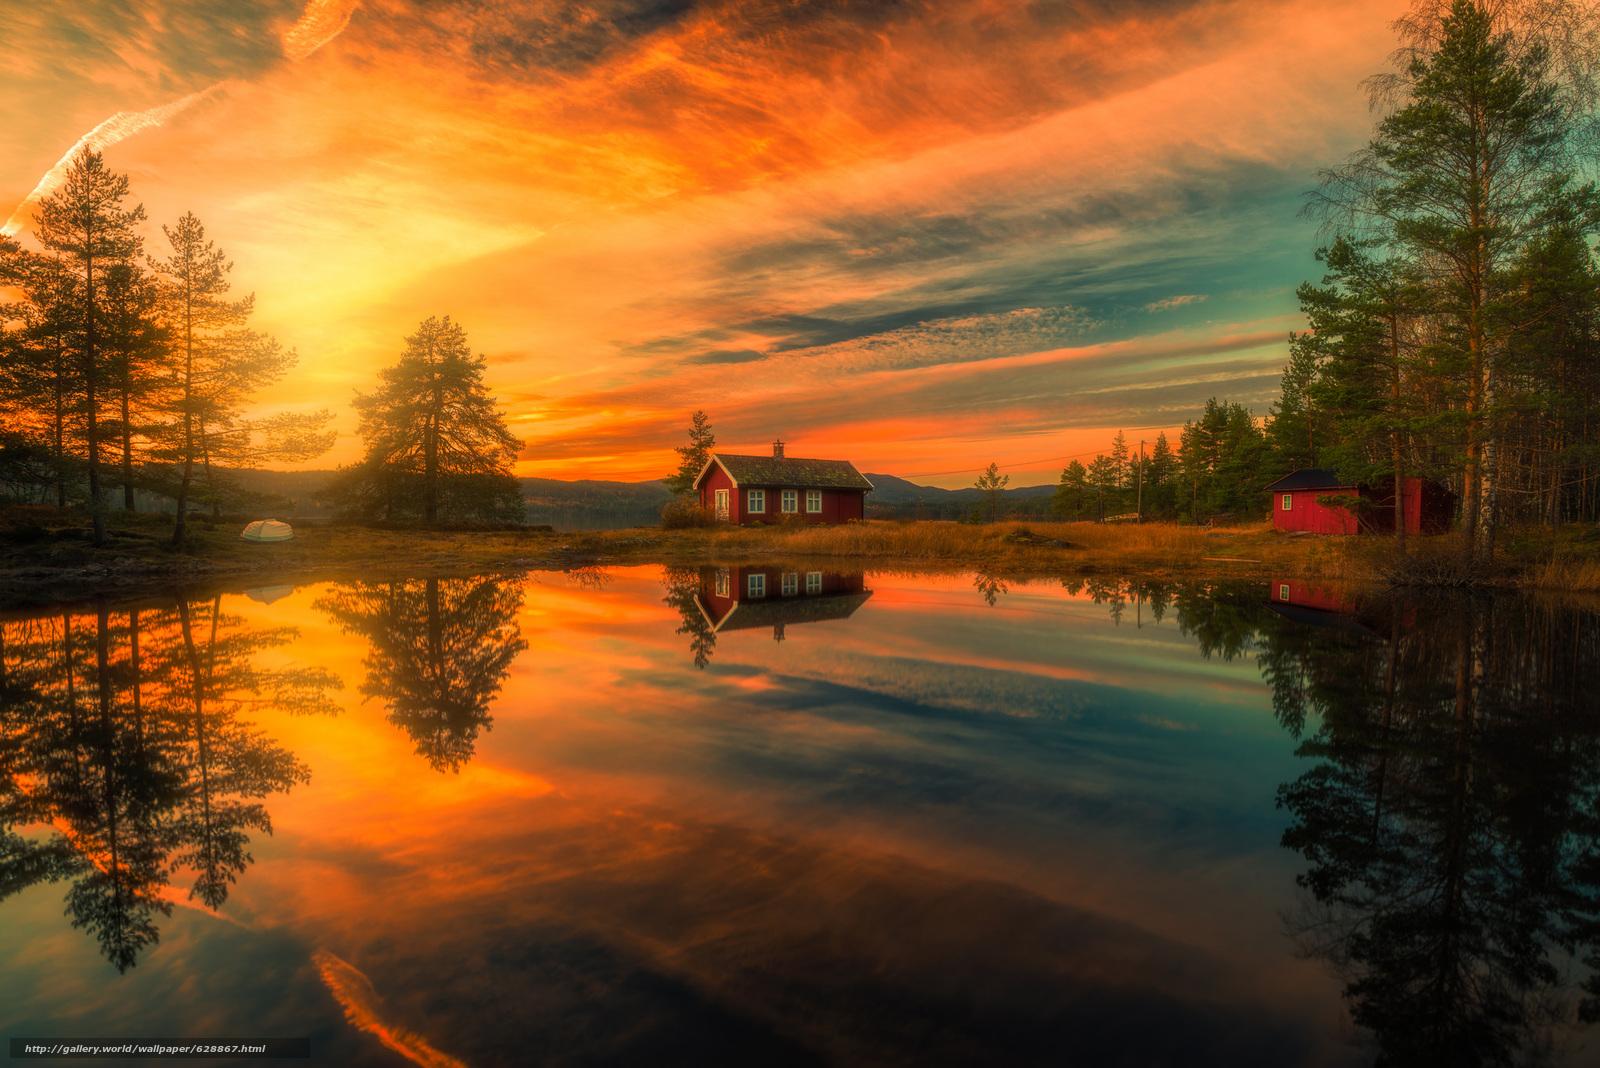 Ringerike, Norway, Рингерике, Норвегия, озеро, отражение, дома, закат, деревья